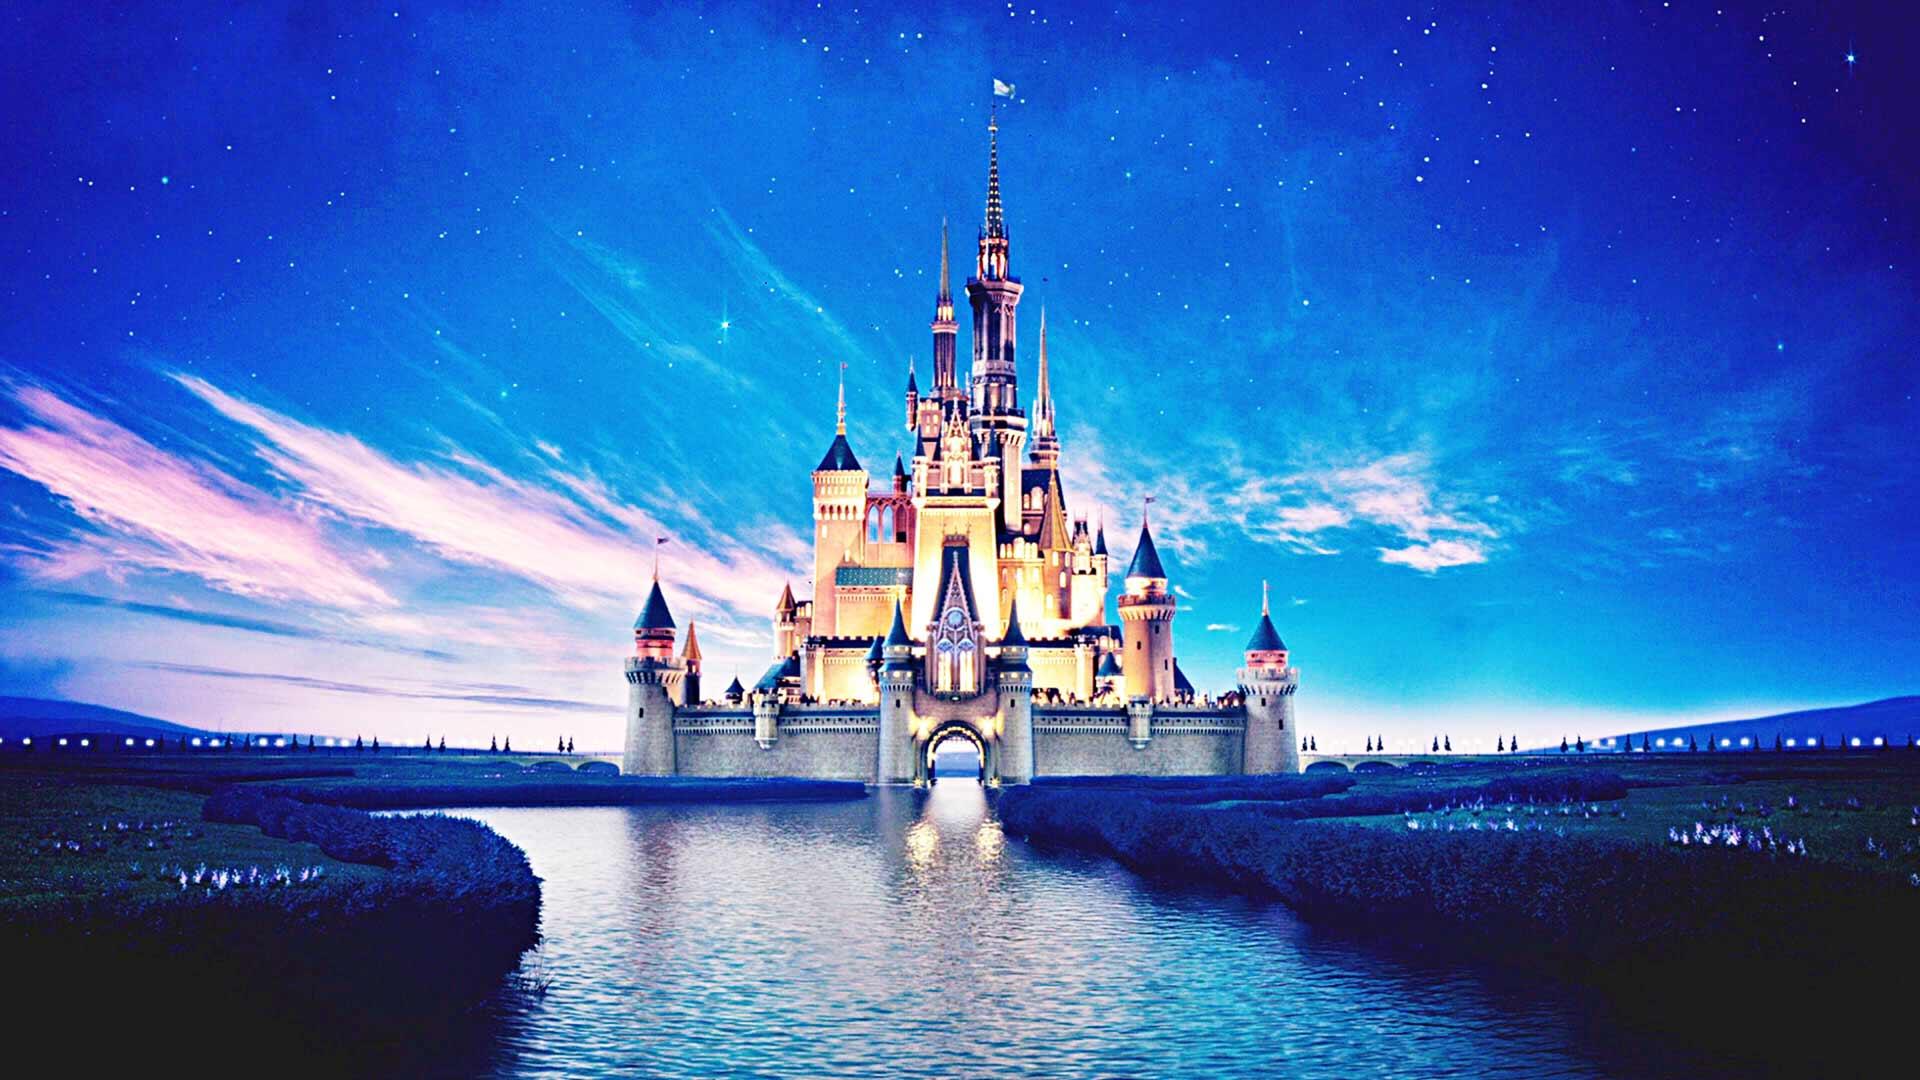 Disney Castle Wallpaper Widescreen